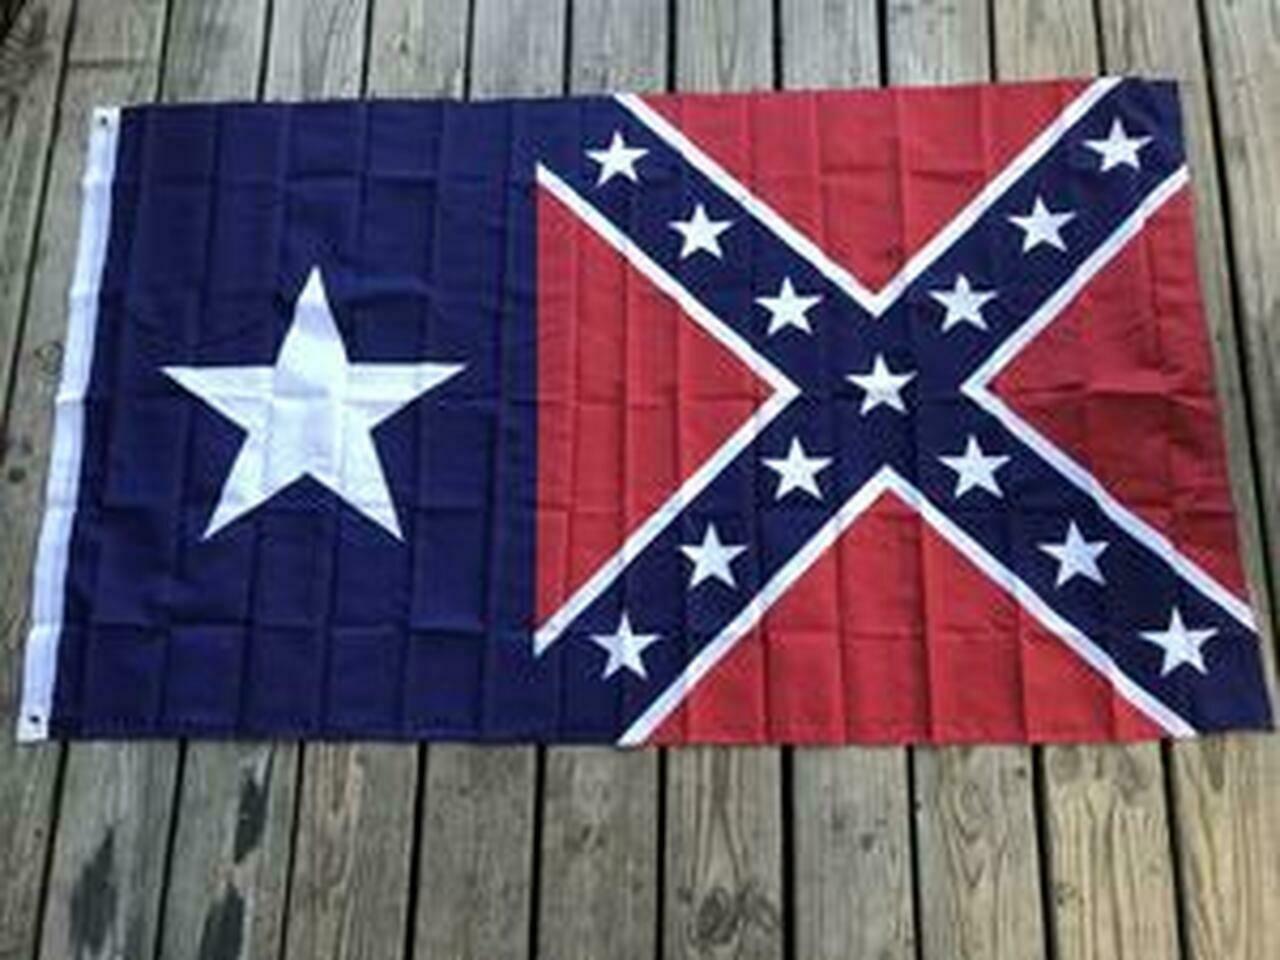 Texas / Battle Flag Combo